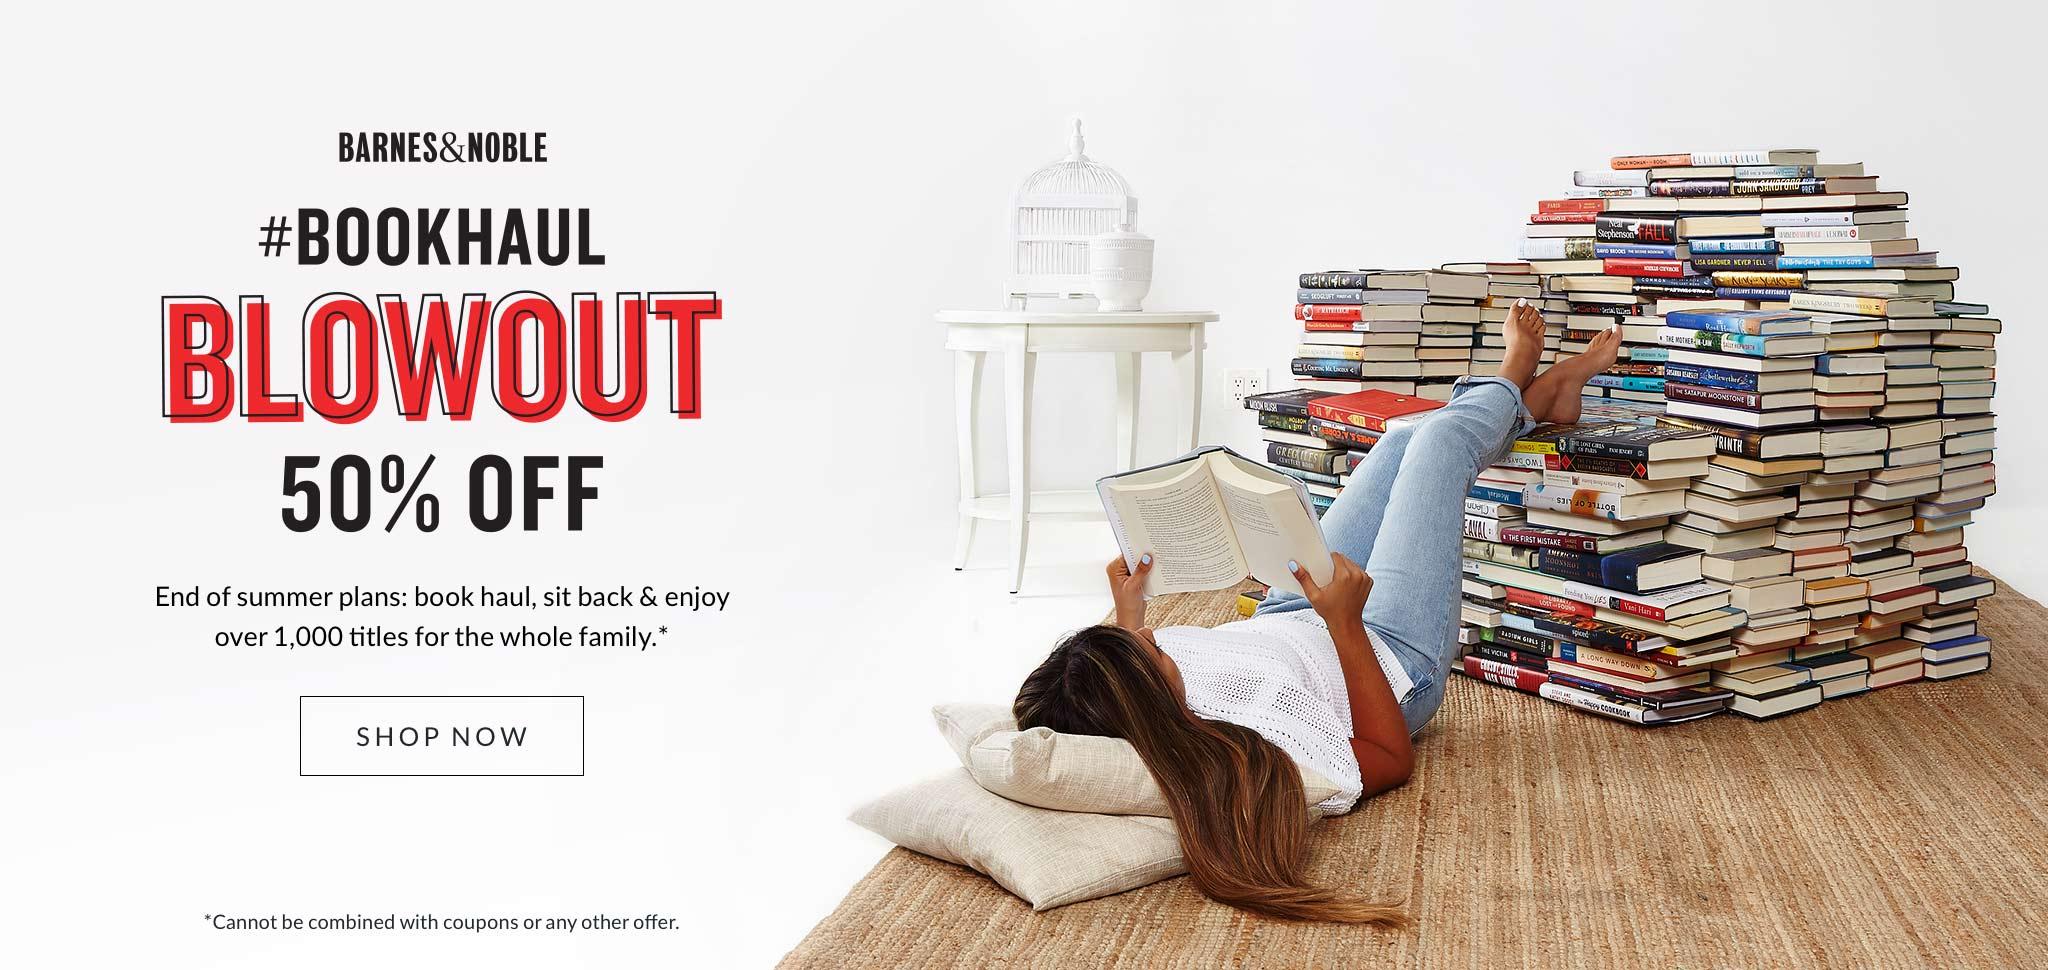 Barnes & Noble #Bookhaul Blowout Save 50% Off